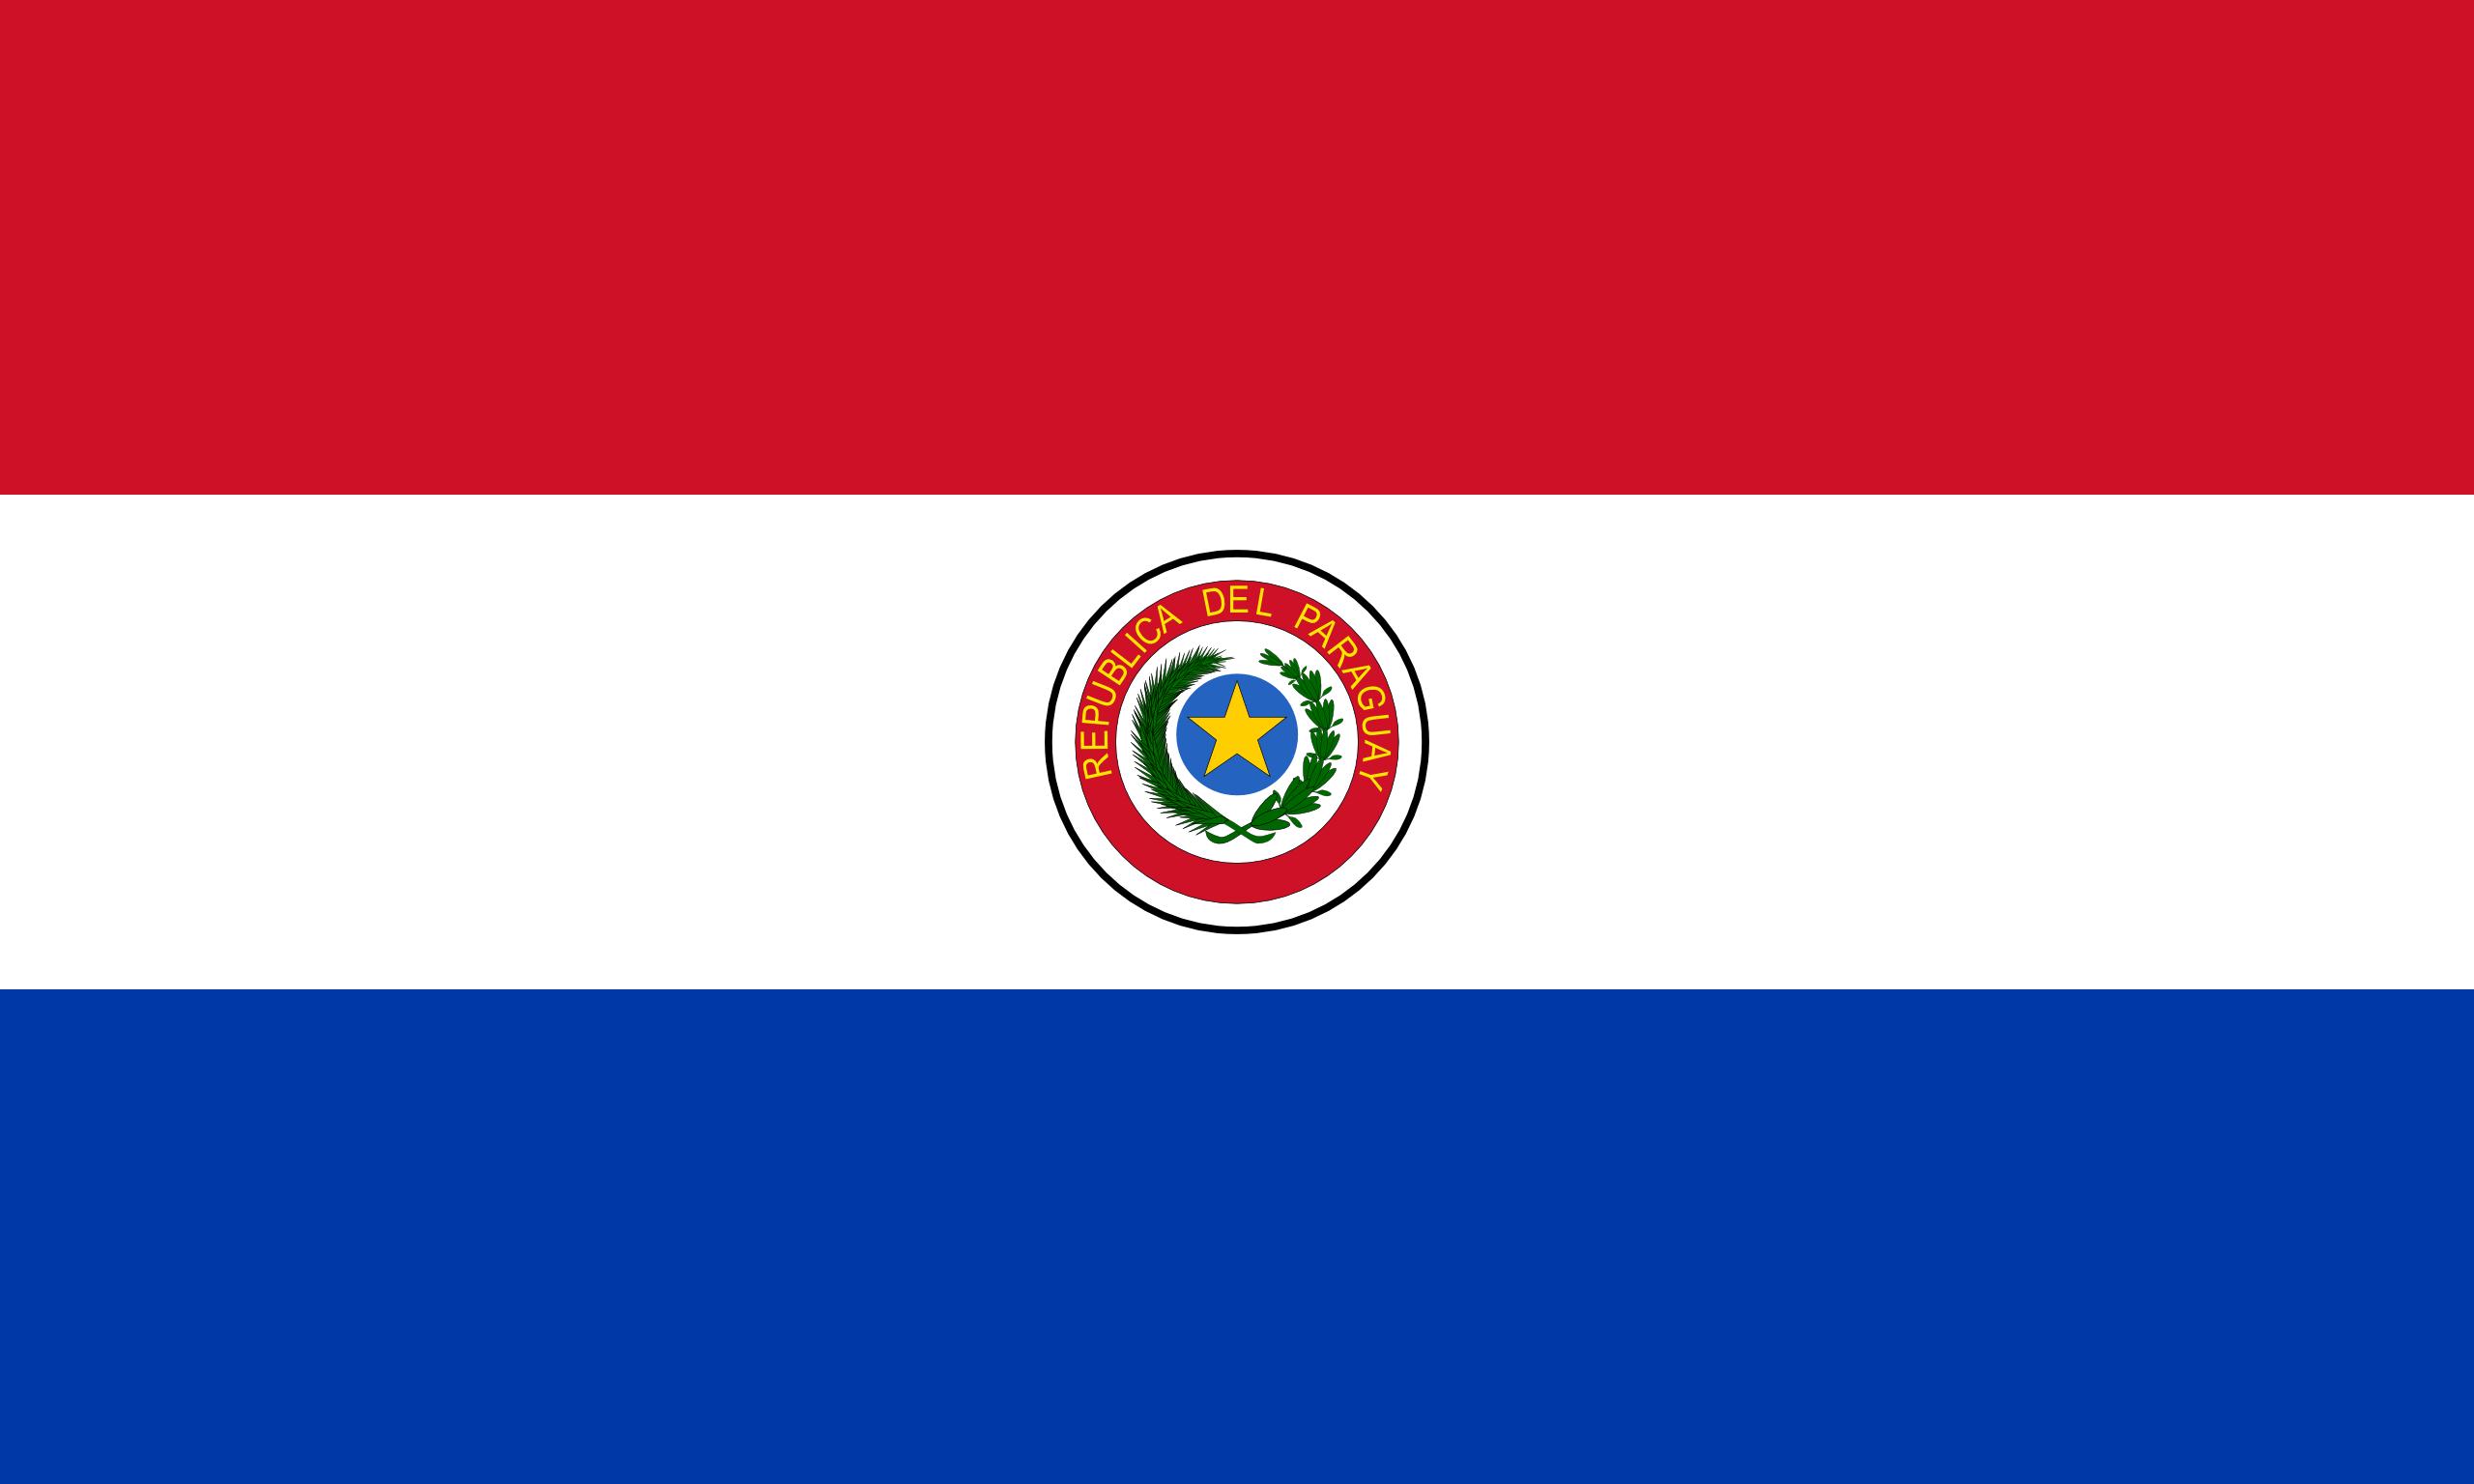 paraguay, país, emblema, insignia, символ - Обои HD - Профессор falken.com